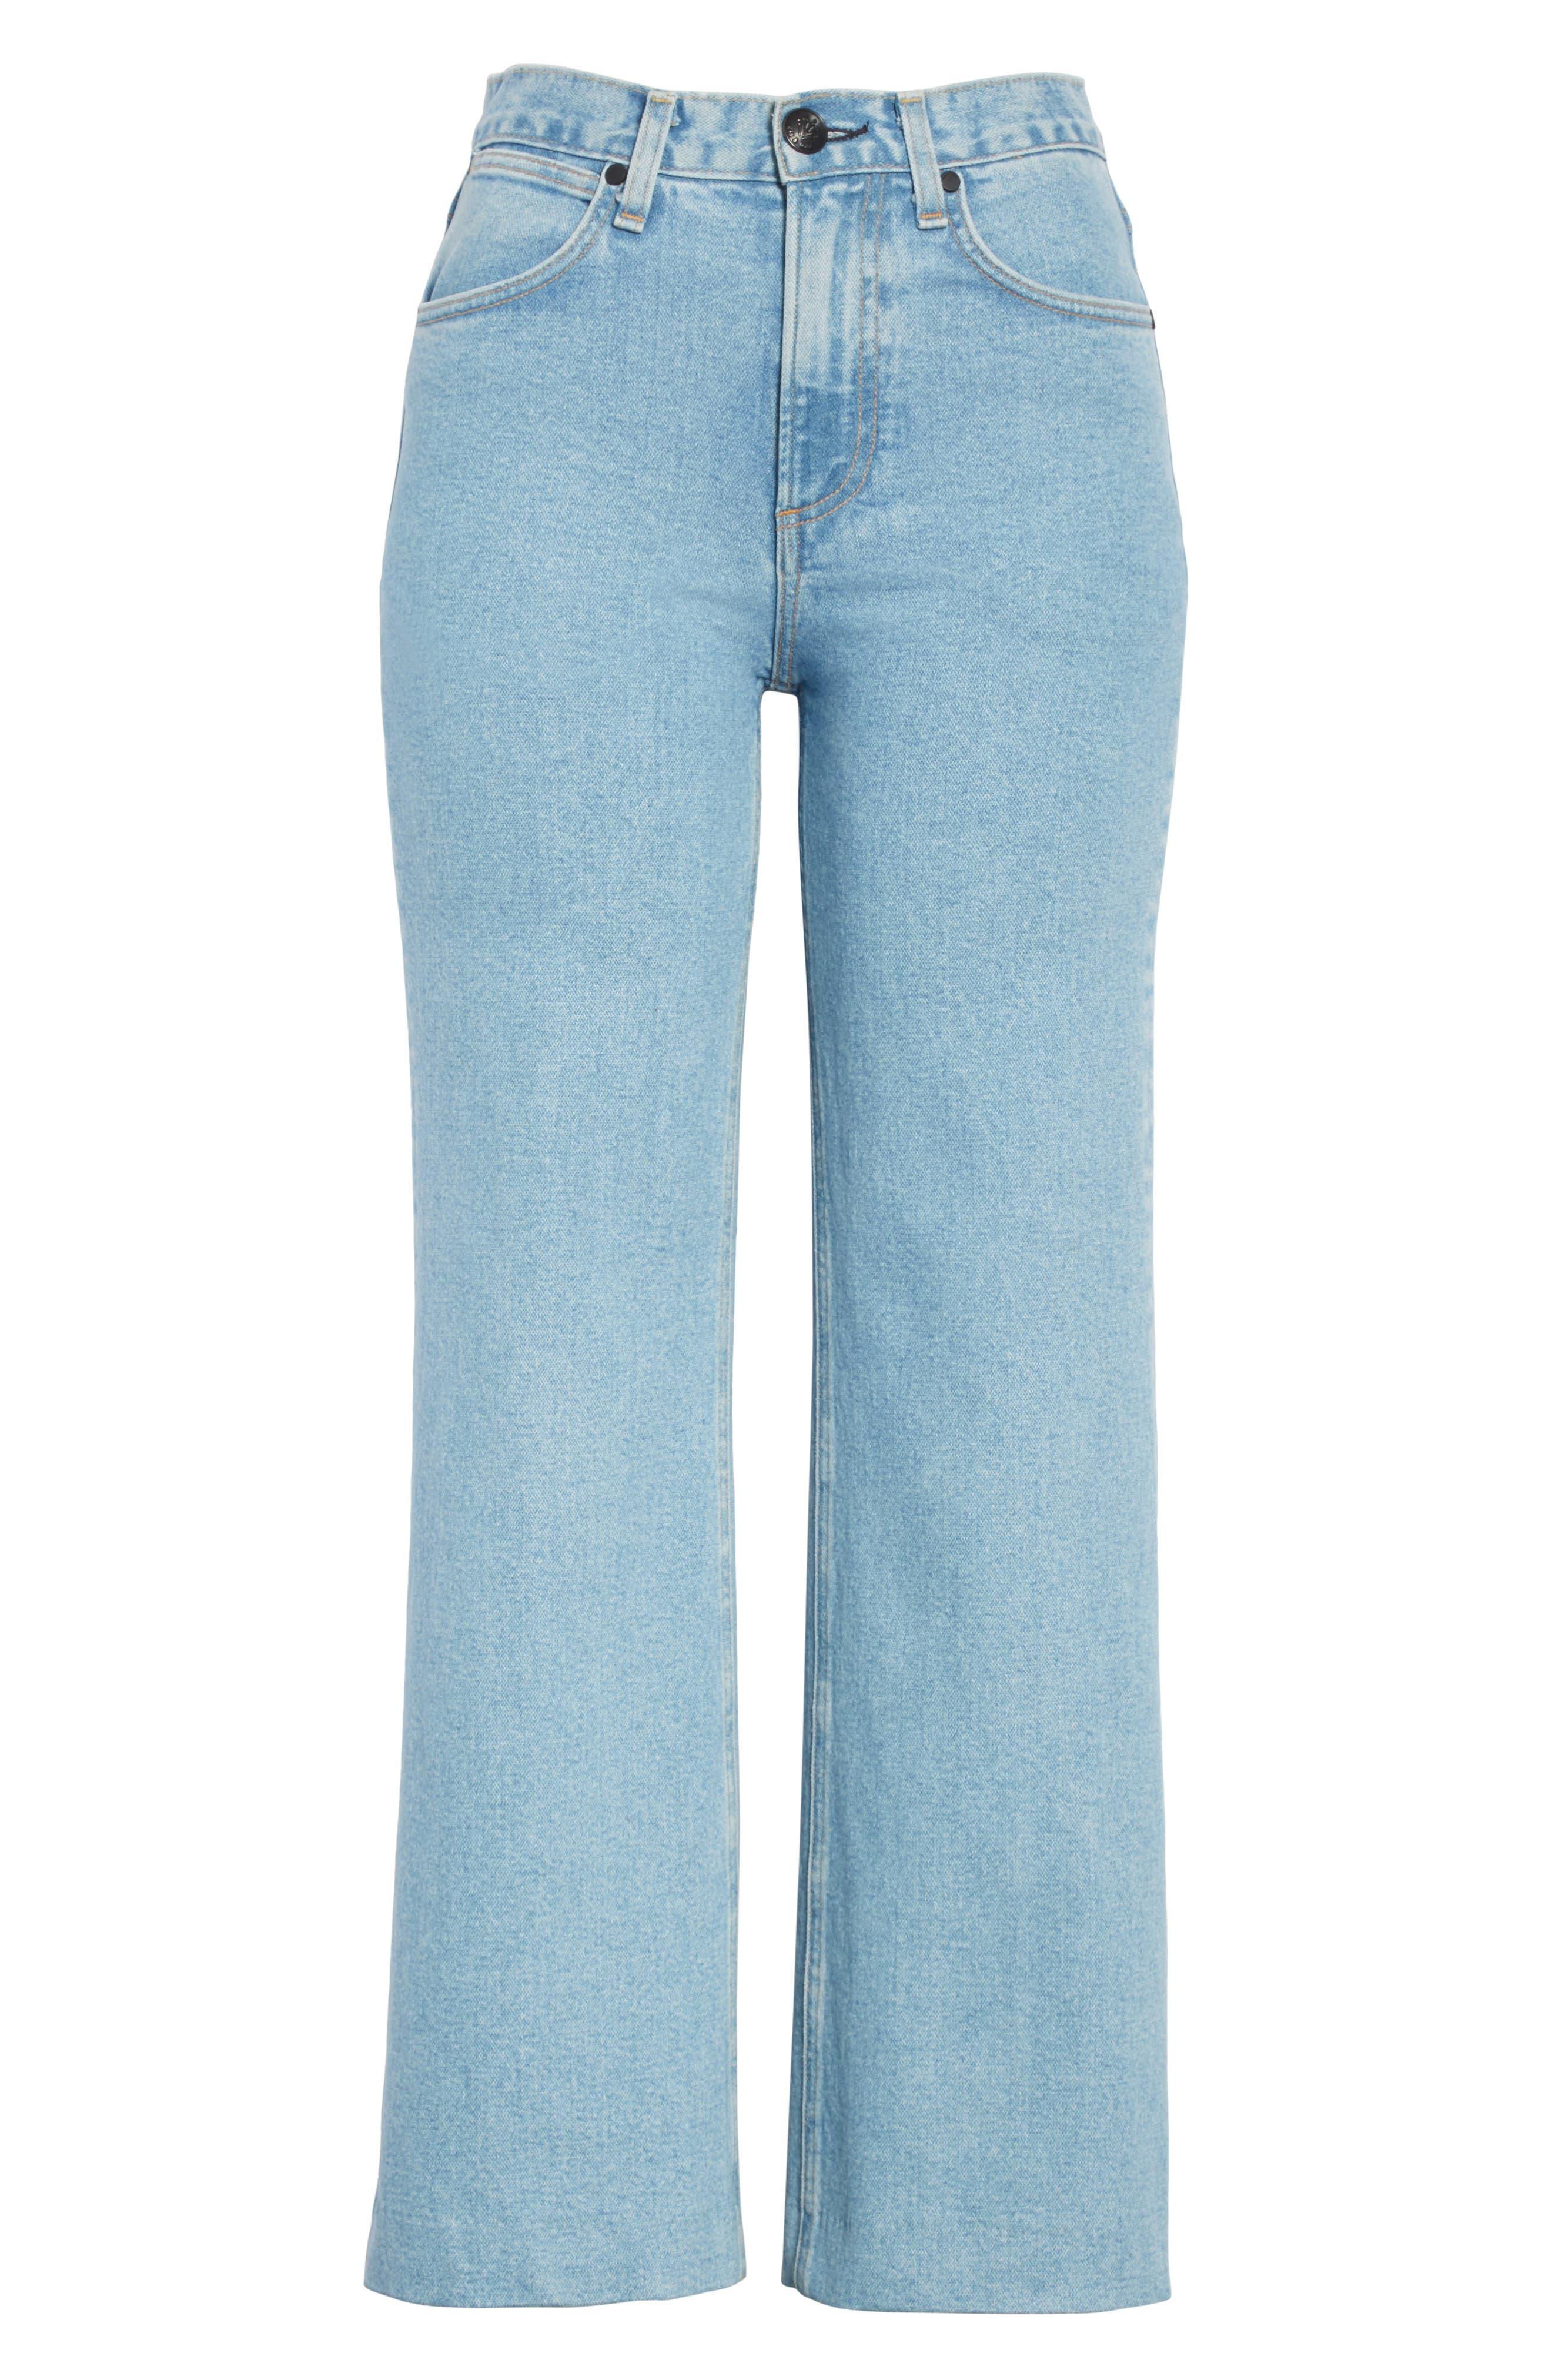 Justine High Waist Wide Leg Trouser Jeans,                             Alternate thumbnail 6, color,                             450